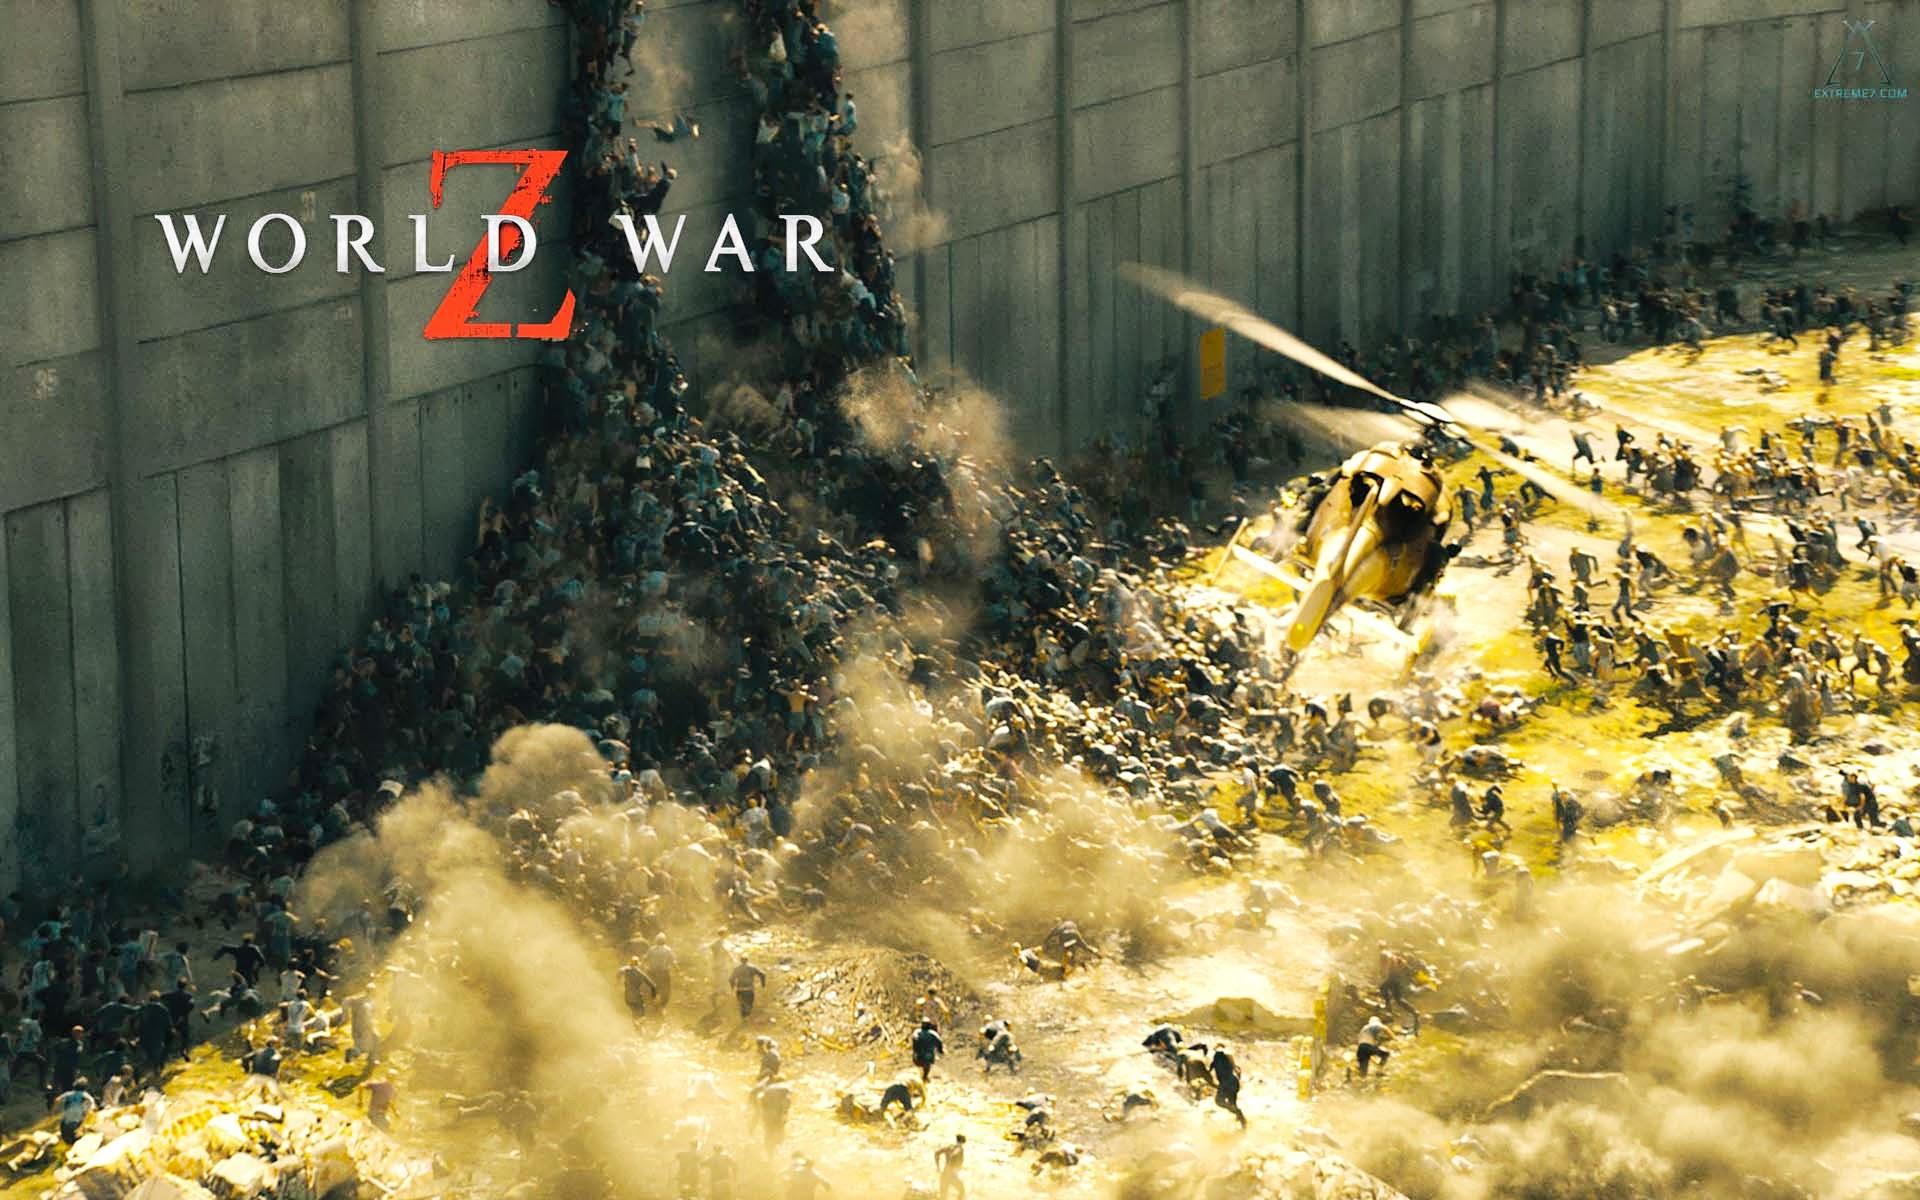 World War Z Hd Wallpaper & Picture